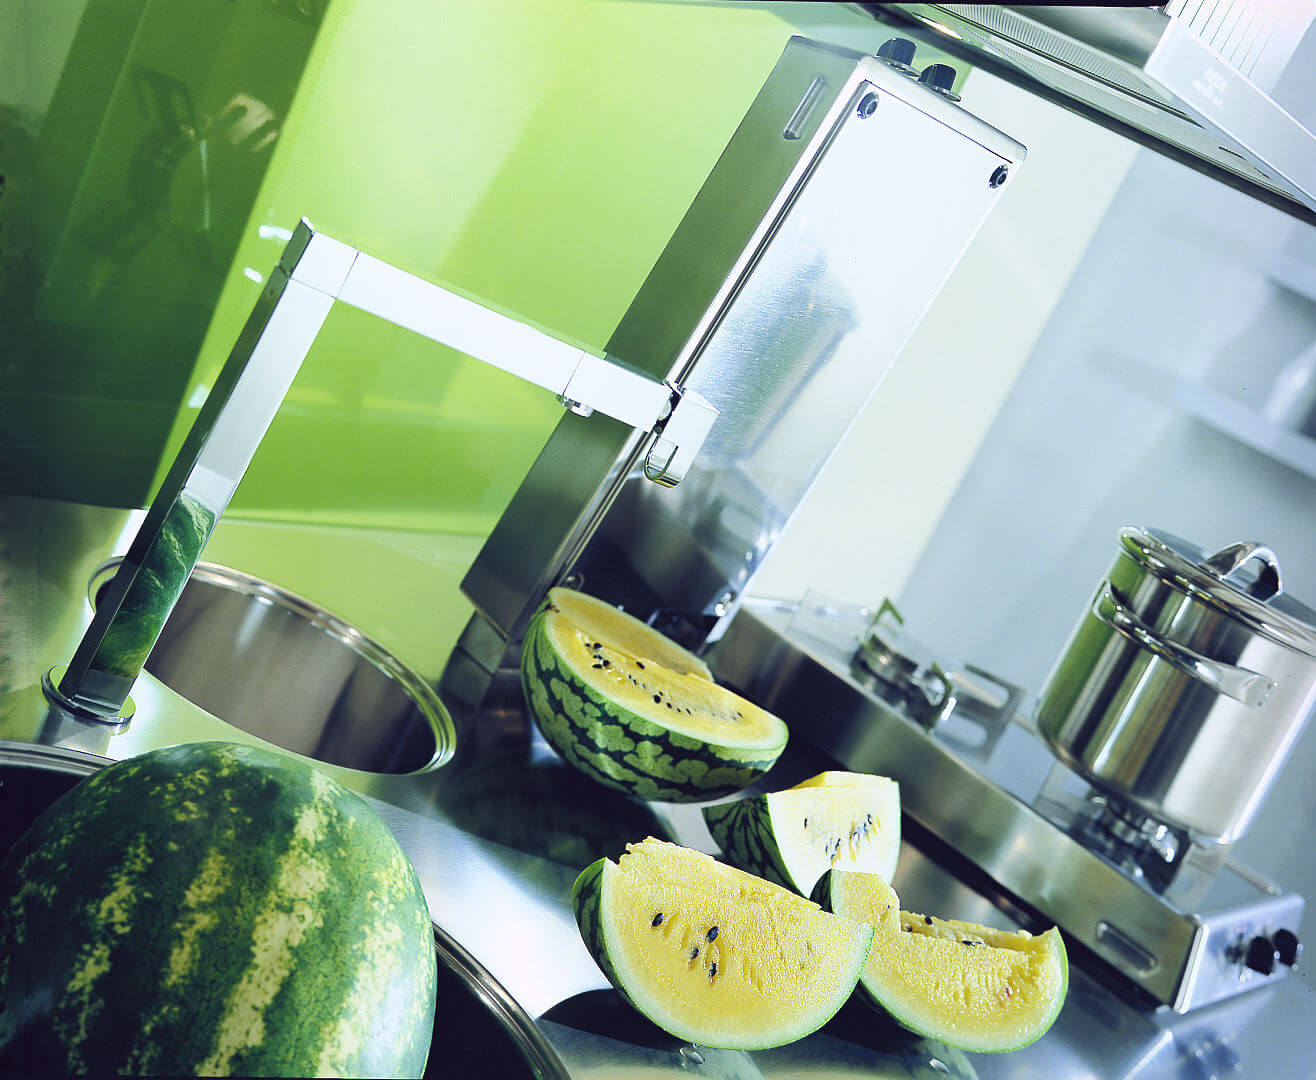 Arca Cucine Italy - Kitchen Stainless Steel Customized - Sink